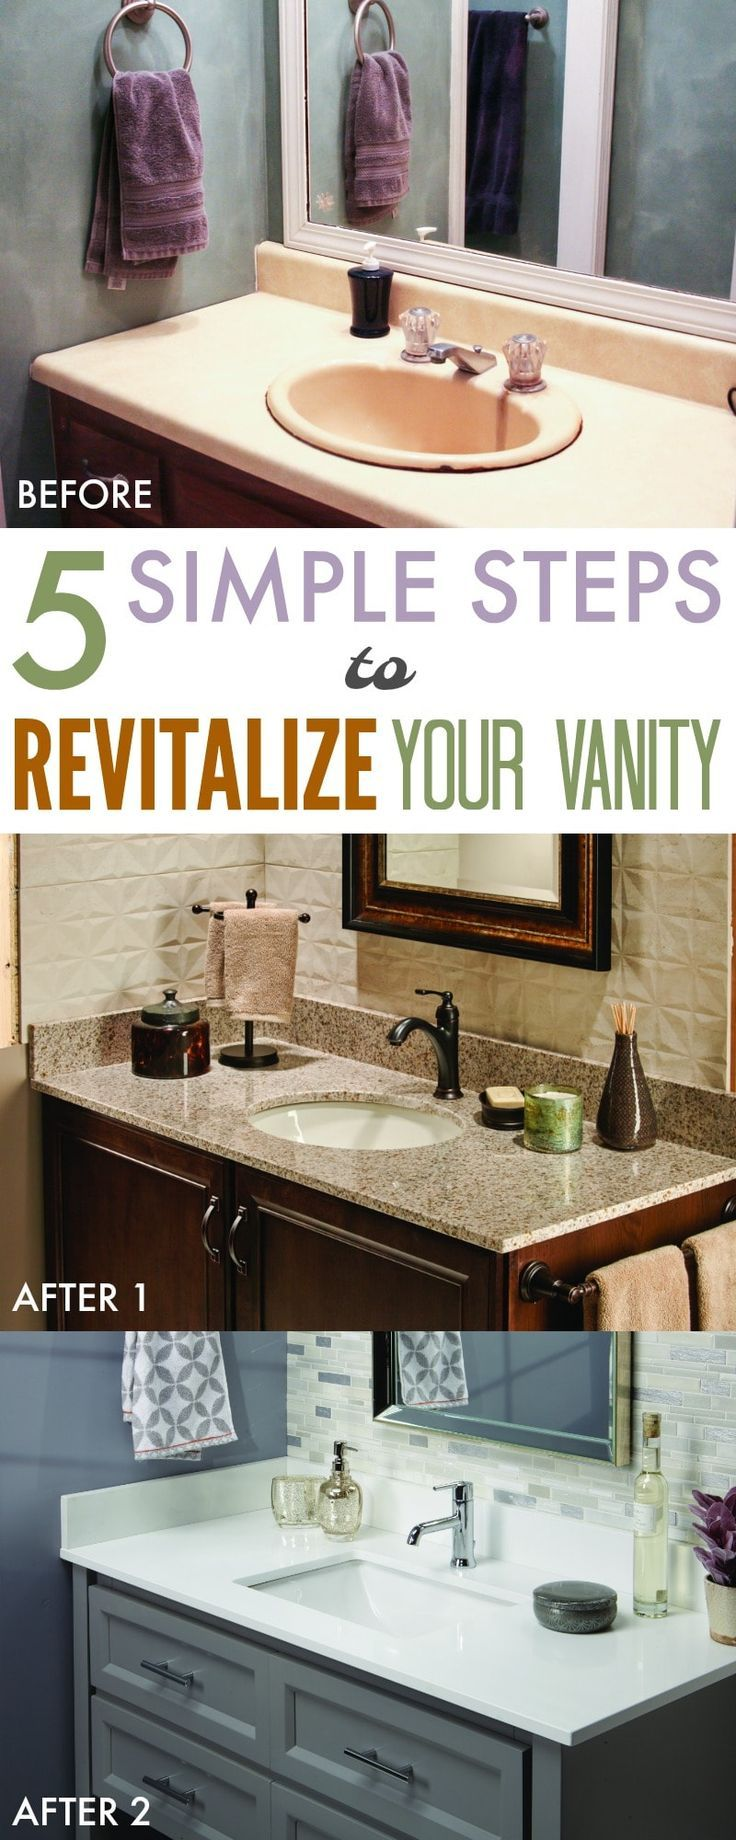 5 Simple Steps To Revitalize Your Bathroom   Au0027Vant Vanity Surfaces.  Remodeling ...